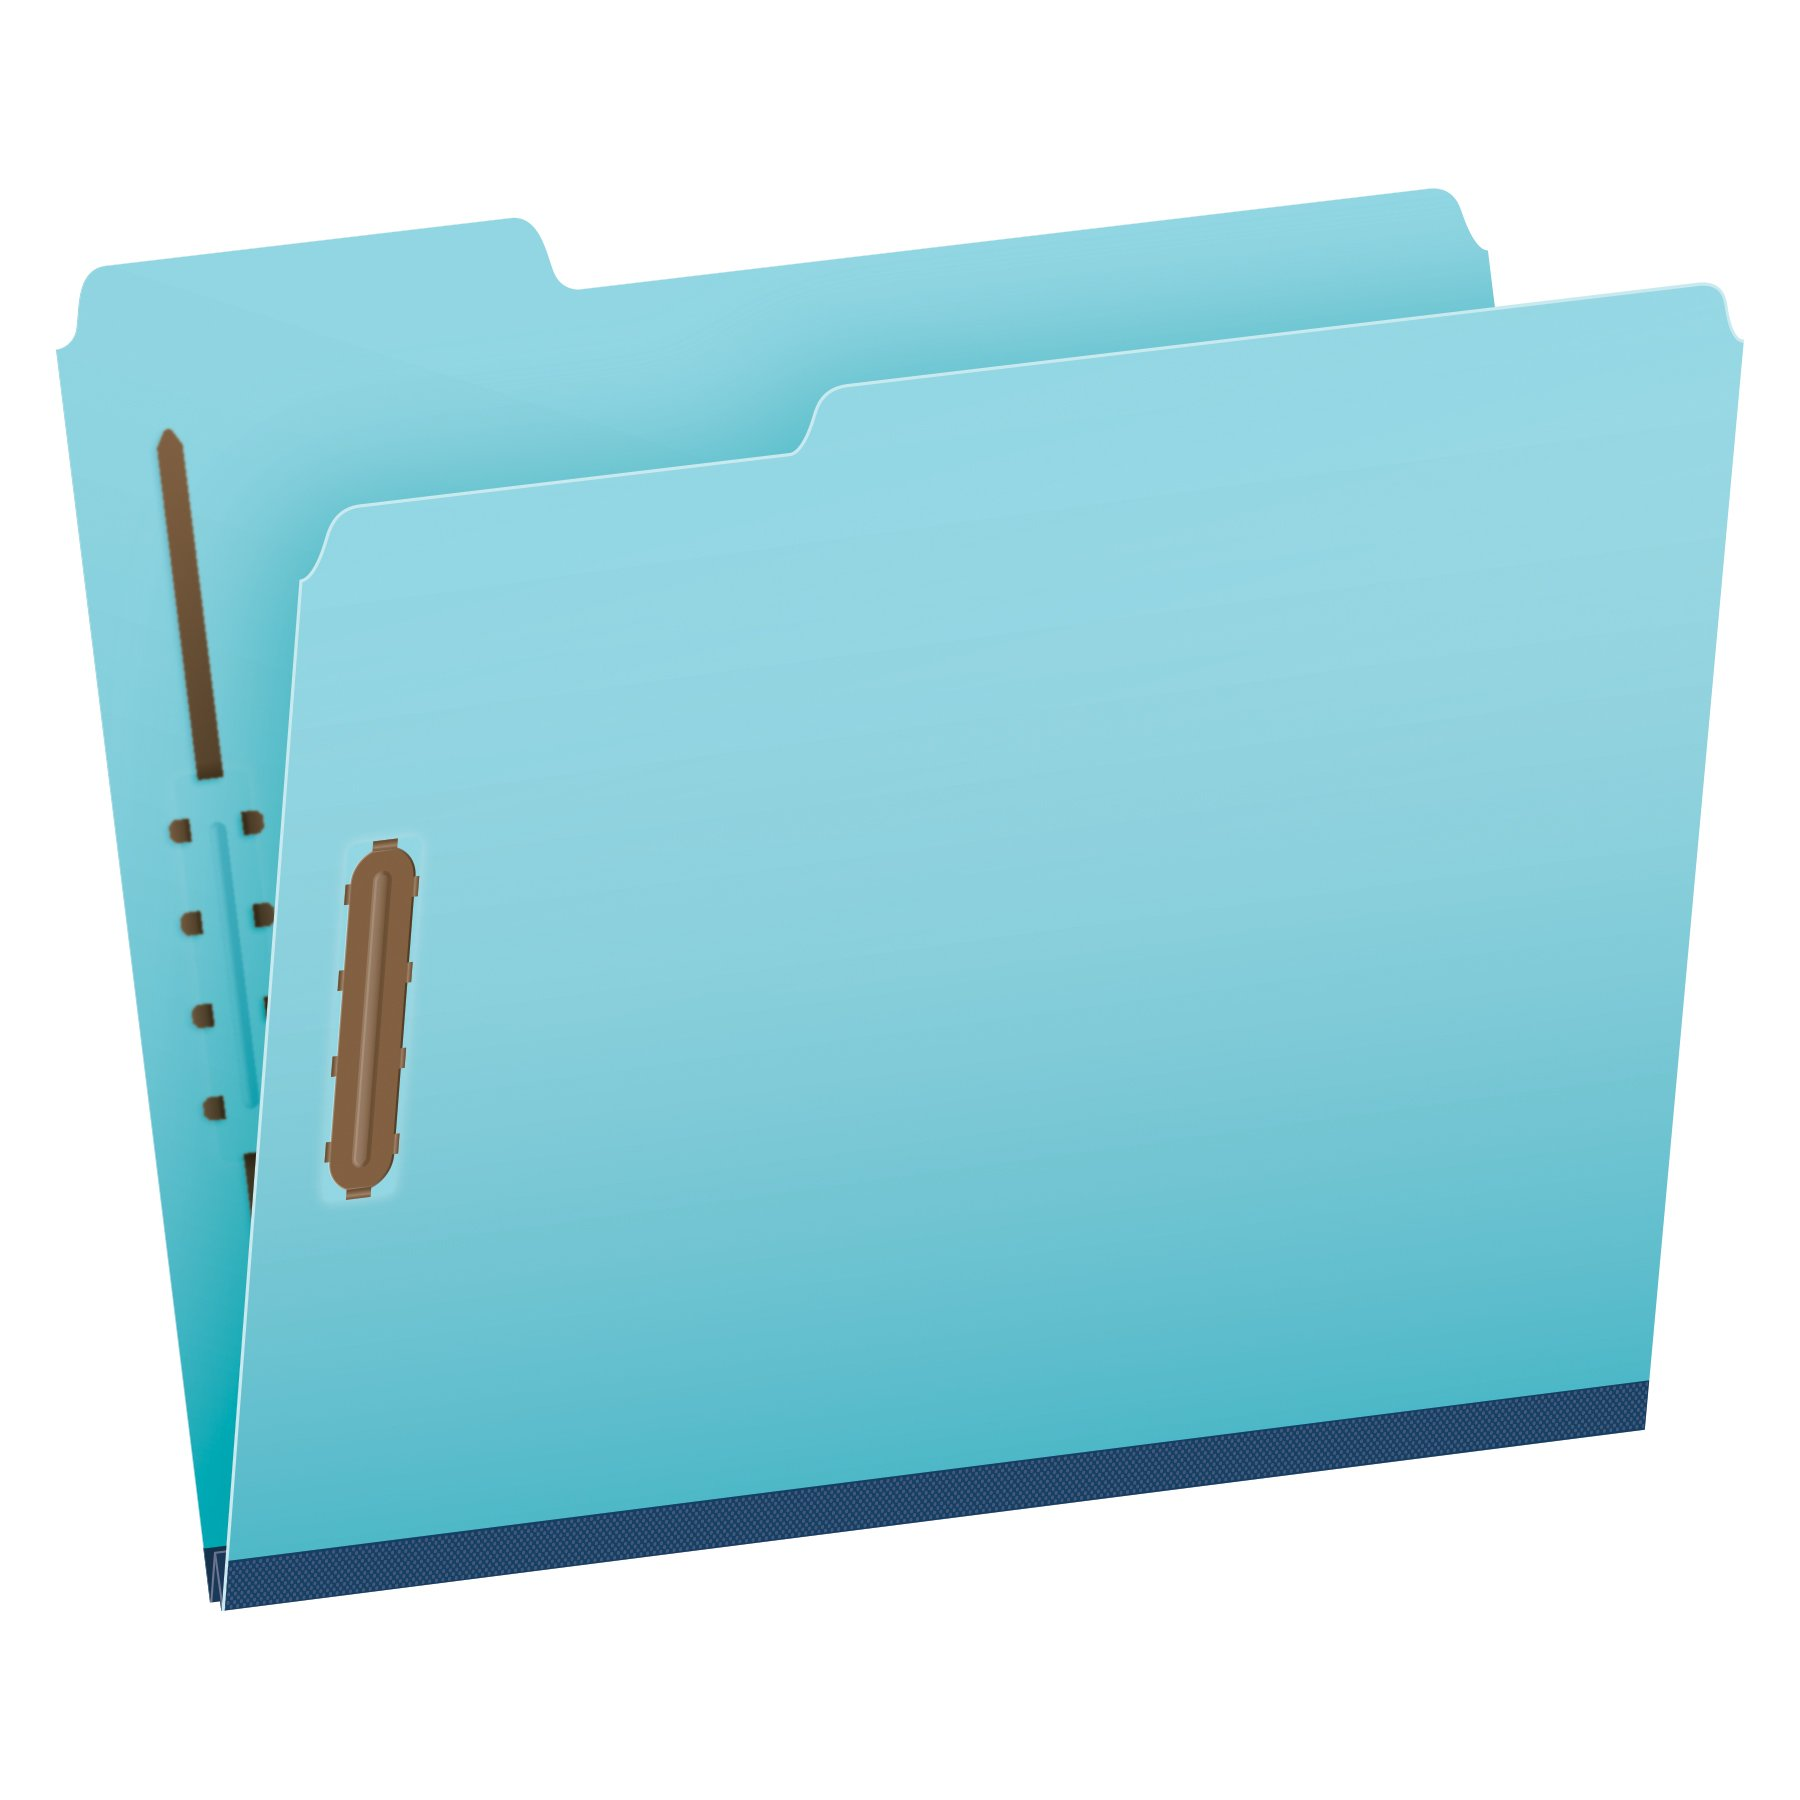 Pendaflex Pressboard Fastener Folders, Letter Size, Light Blue, 1'' Expansion, 1/3 Cut, 25/BX (615F21-3BLU)